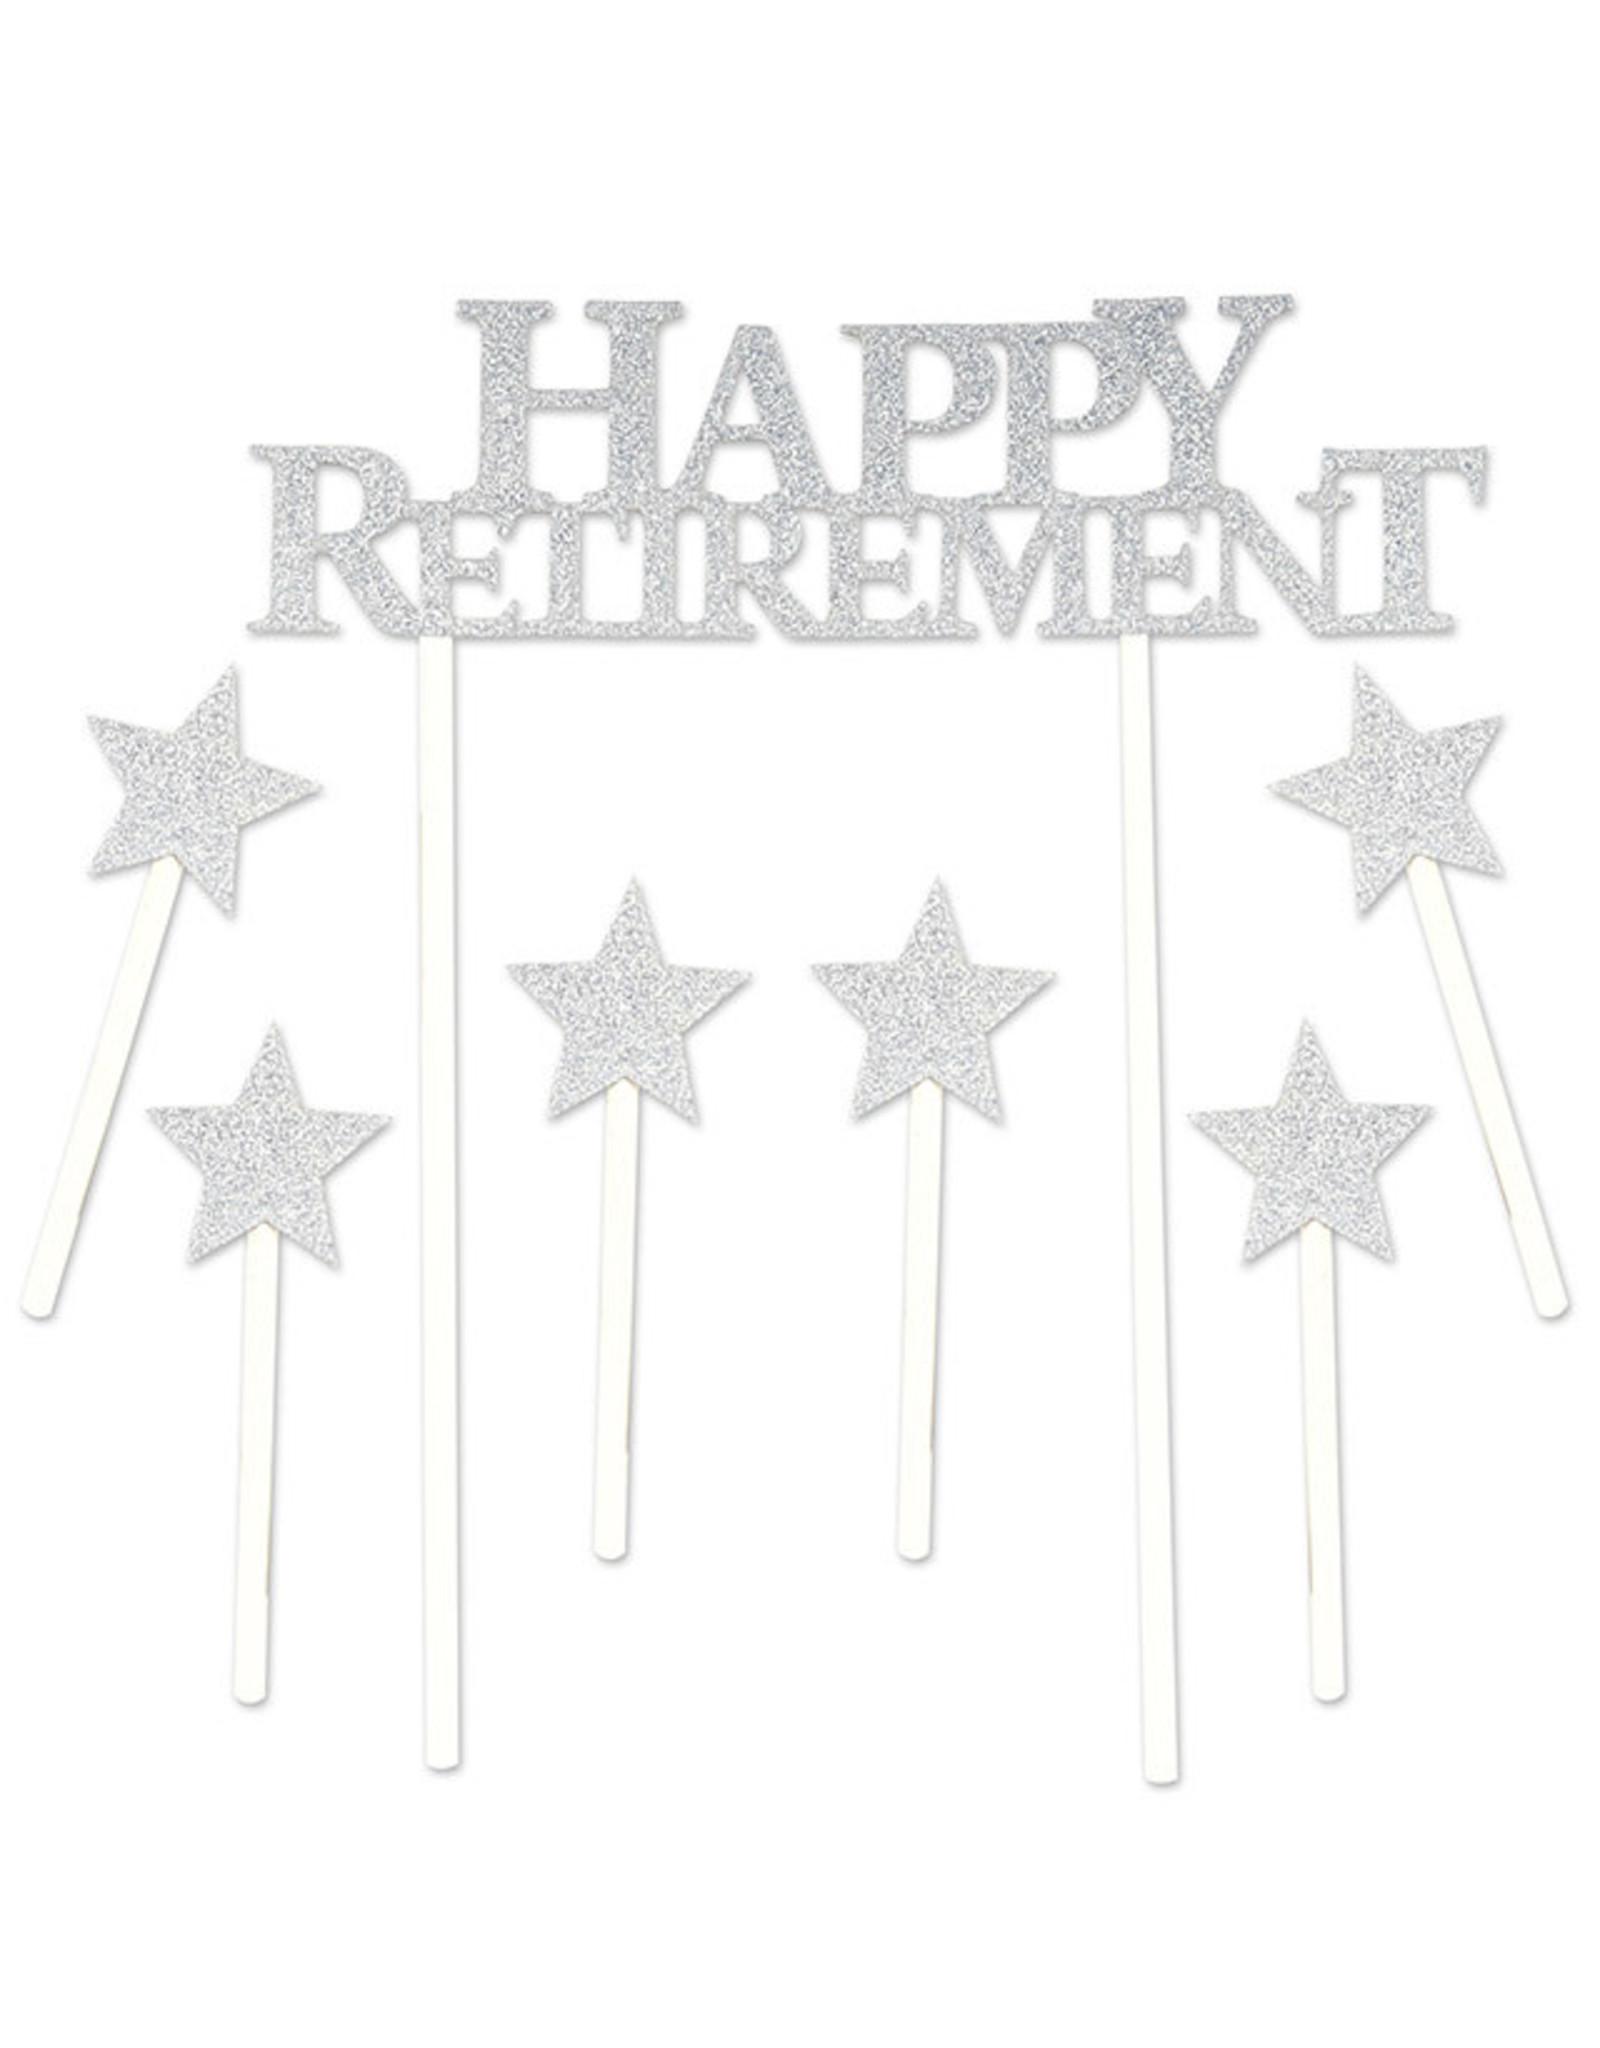 Beistle Happy Retirement Cake Topper